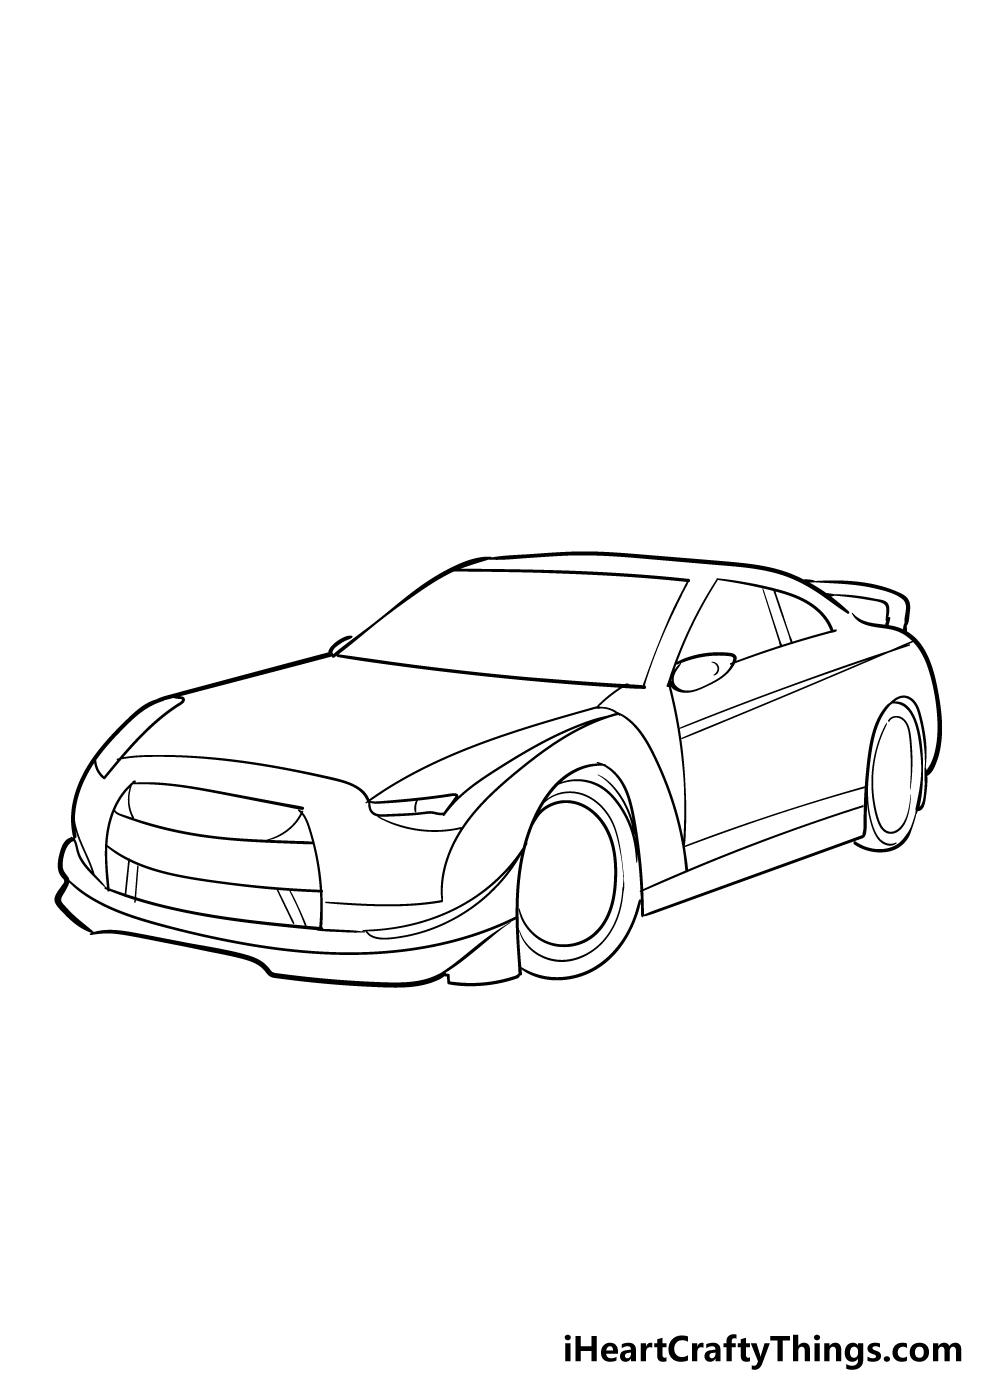 racecar drawing step 4